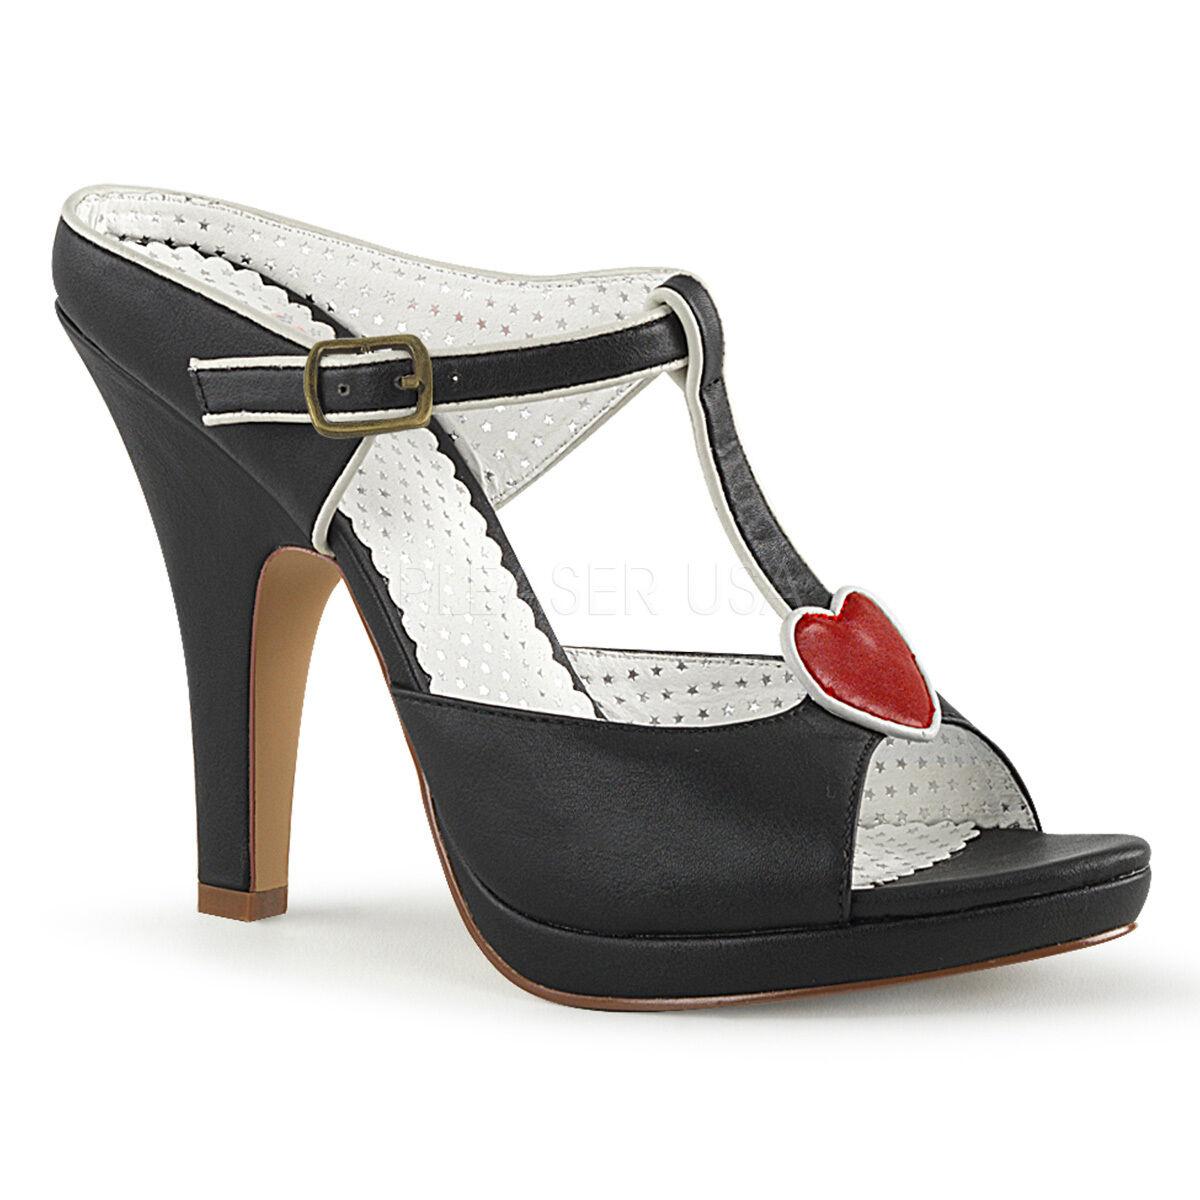 Sexy 4' High Heel Mini Platform T-Strap Shoes Slides w/ Heart Accent SIR09/BPU